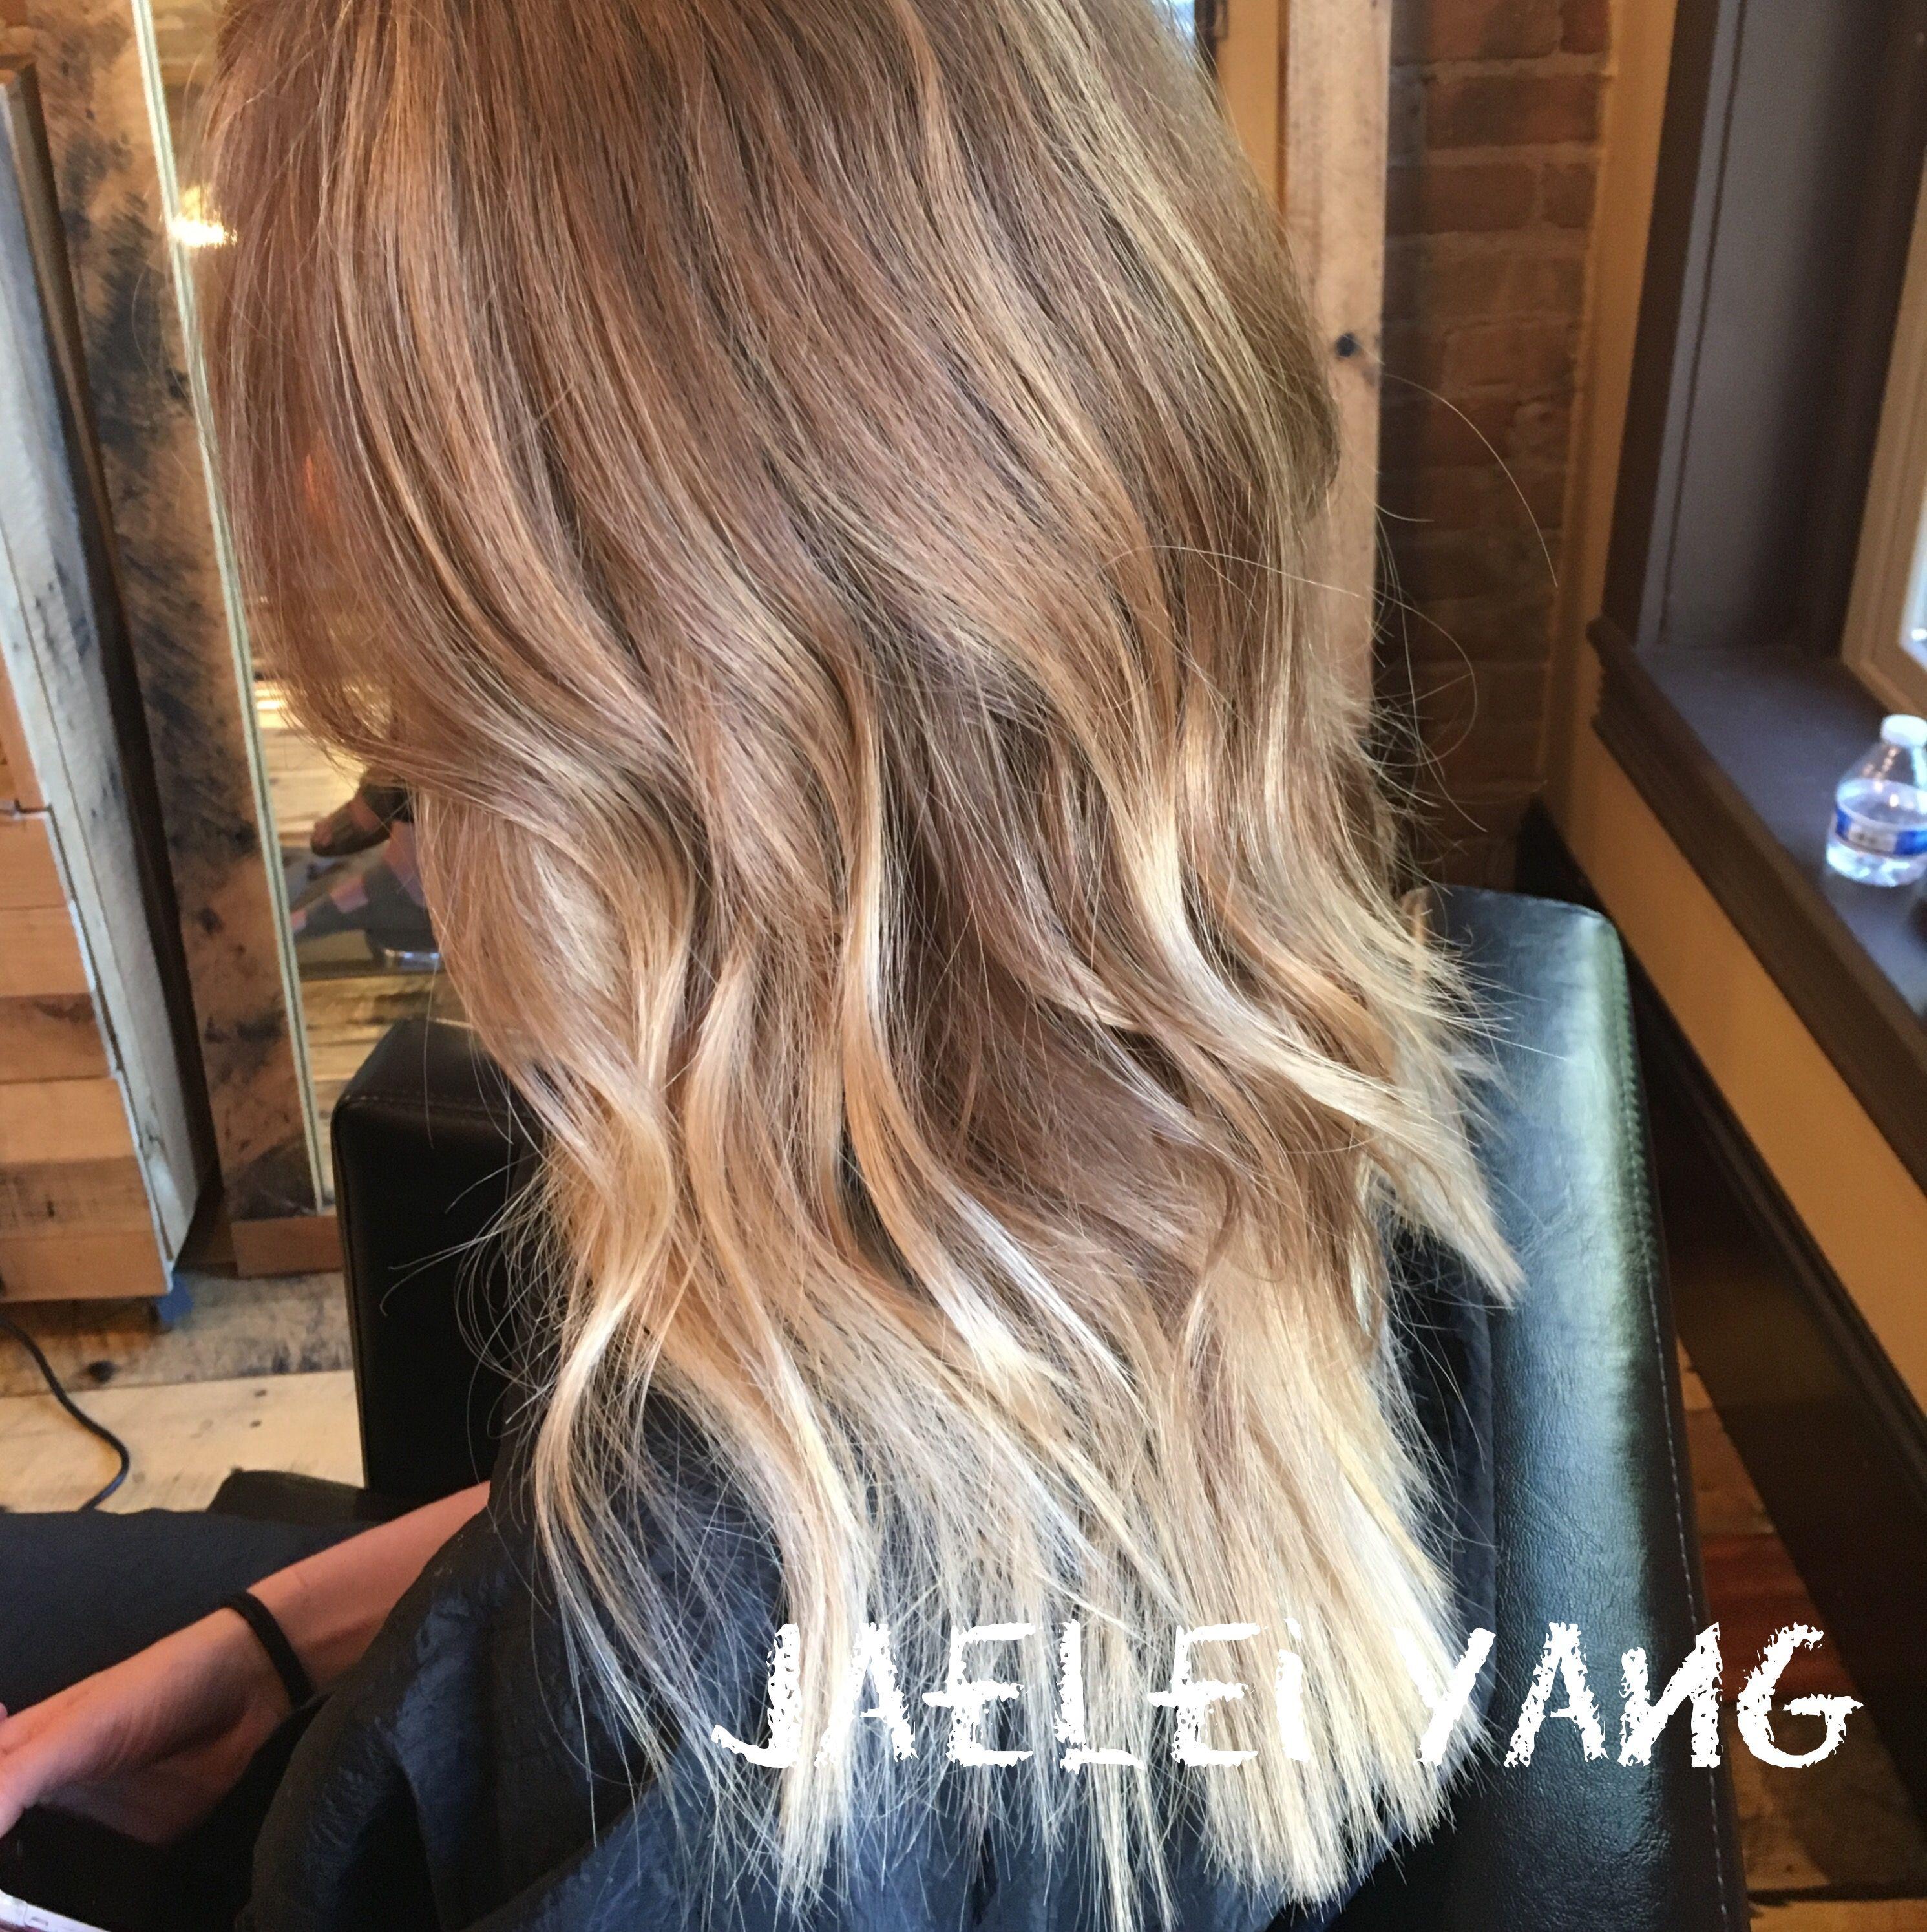 Balayage By Jaelei At Bold Salon 207 W College Ave Appleton Wi 54911 920 931 2737 Jaeleiyangbeauty WordPress Com Hair Balayage Hair Styles